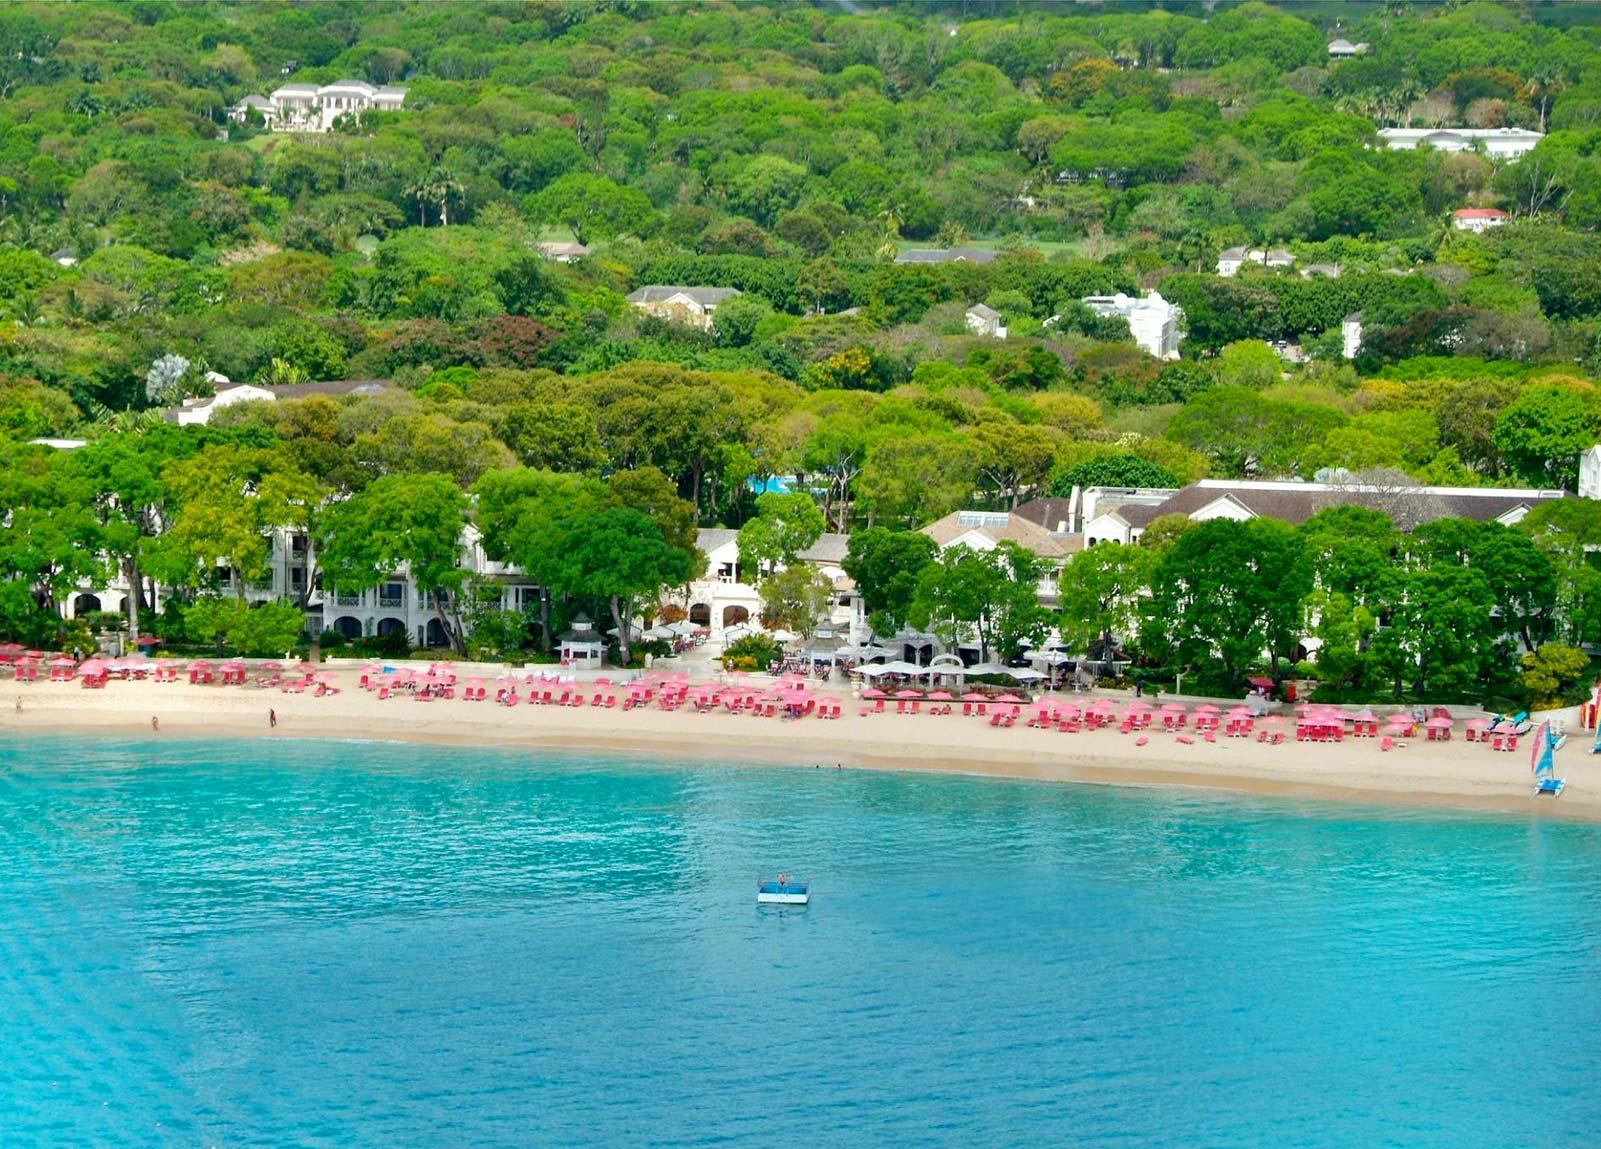 Caribbean Luxury Hotels Caribbean 5 Star Hotels